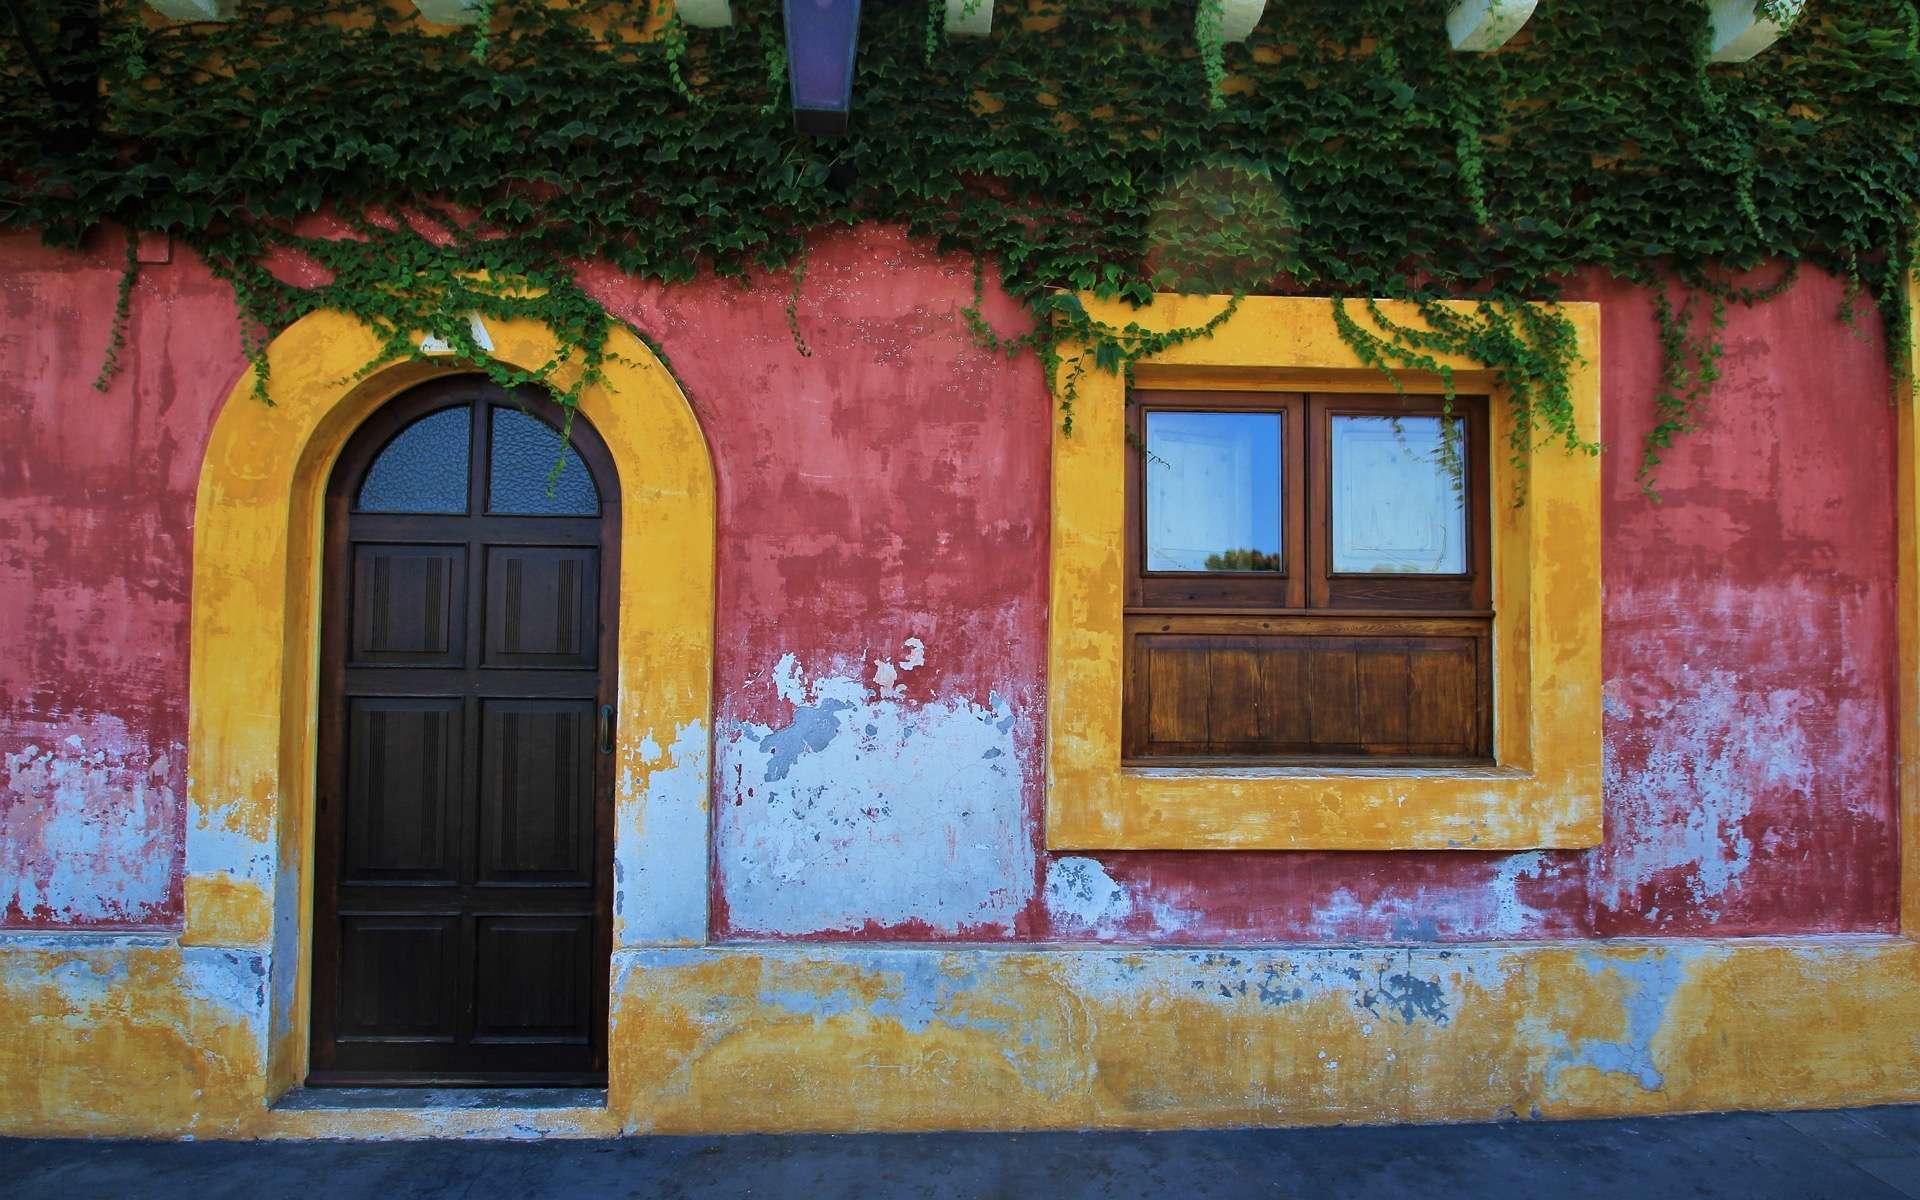 Une maison colorée du village Stromboli (Italie). © Jacky Jeannet, Adobe Stock